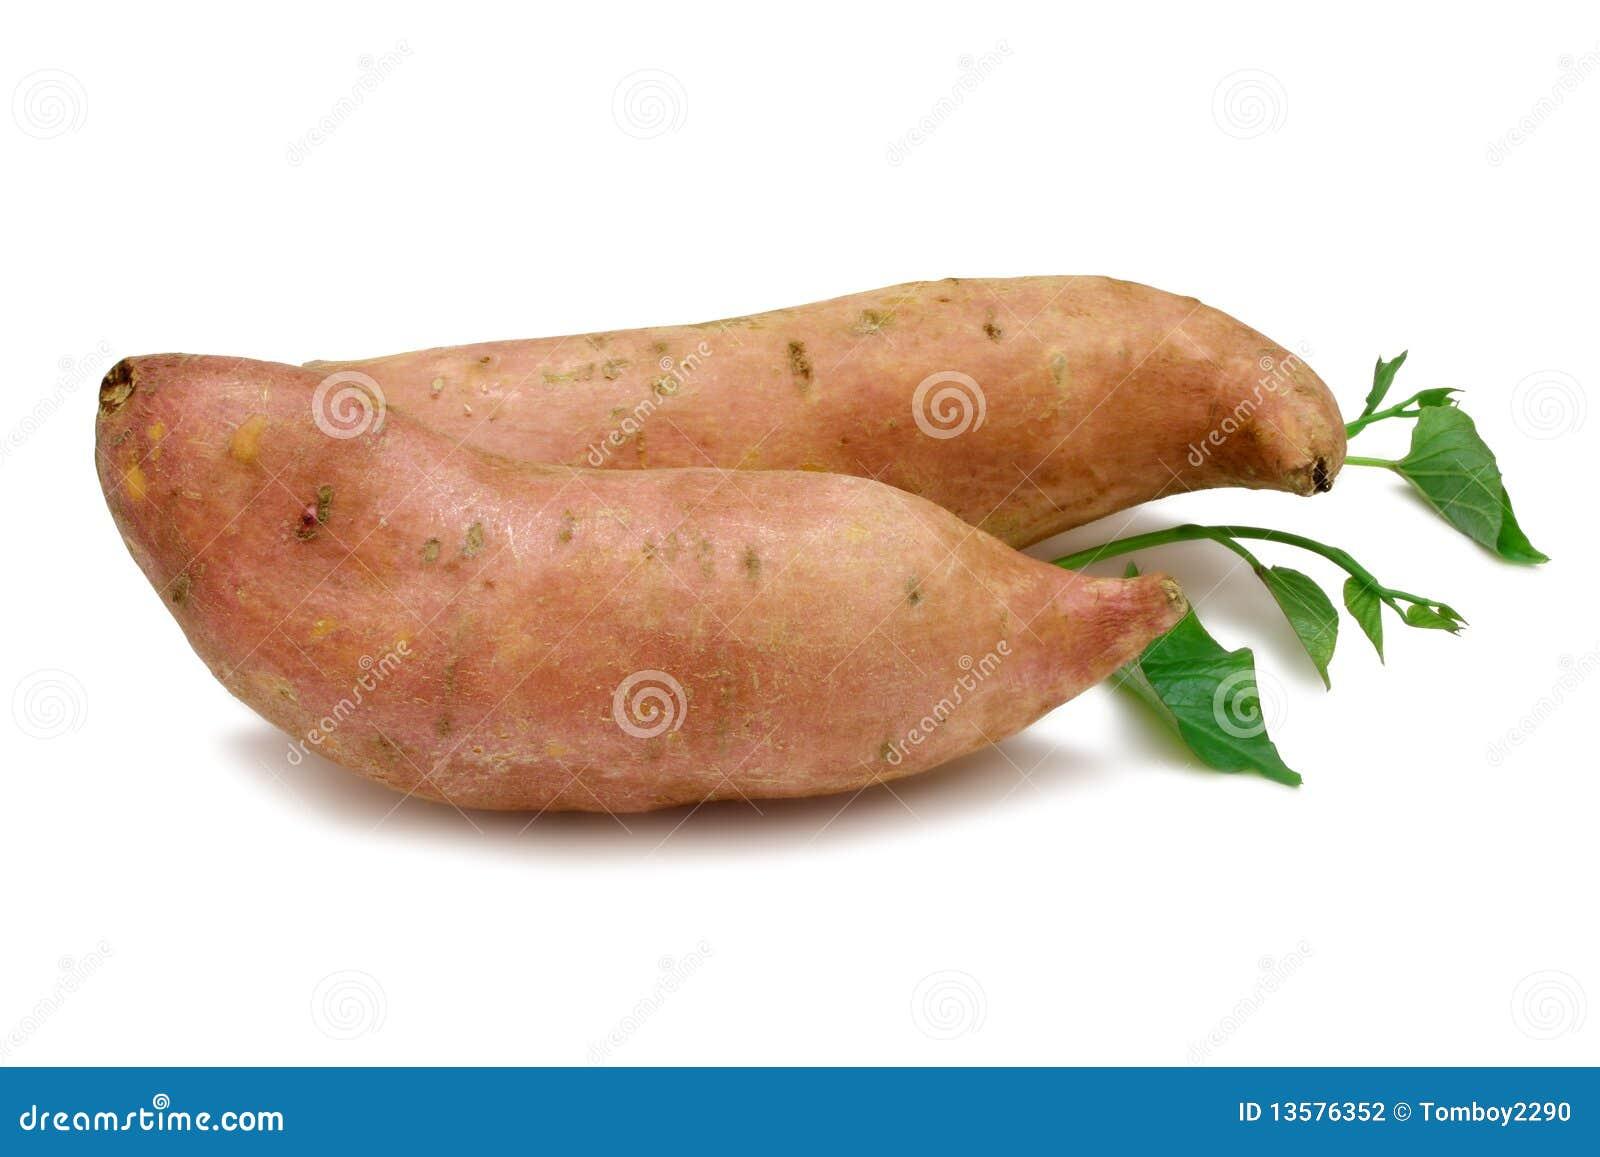 Two orange Kumara (Sweet Potato) isolated on white with leaves from ...